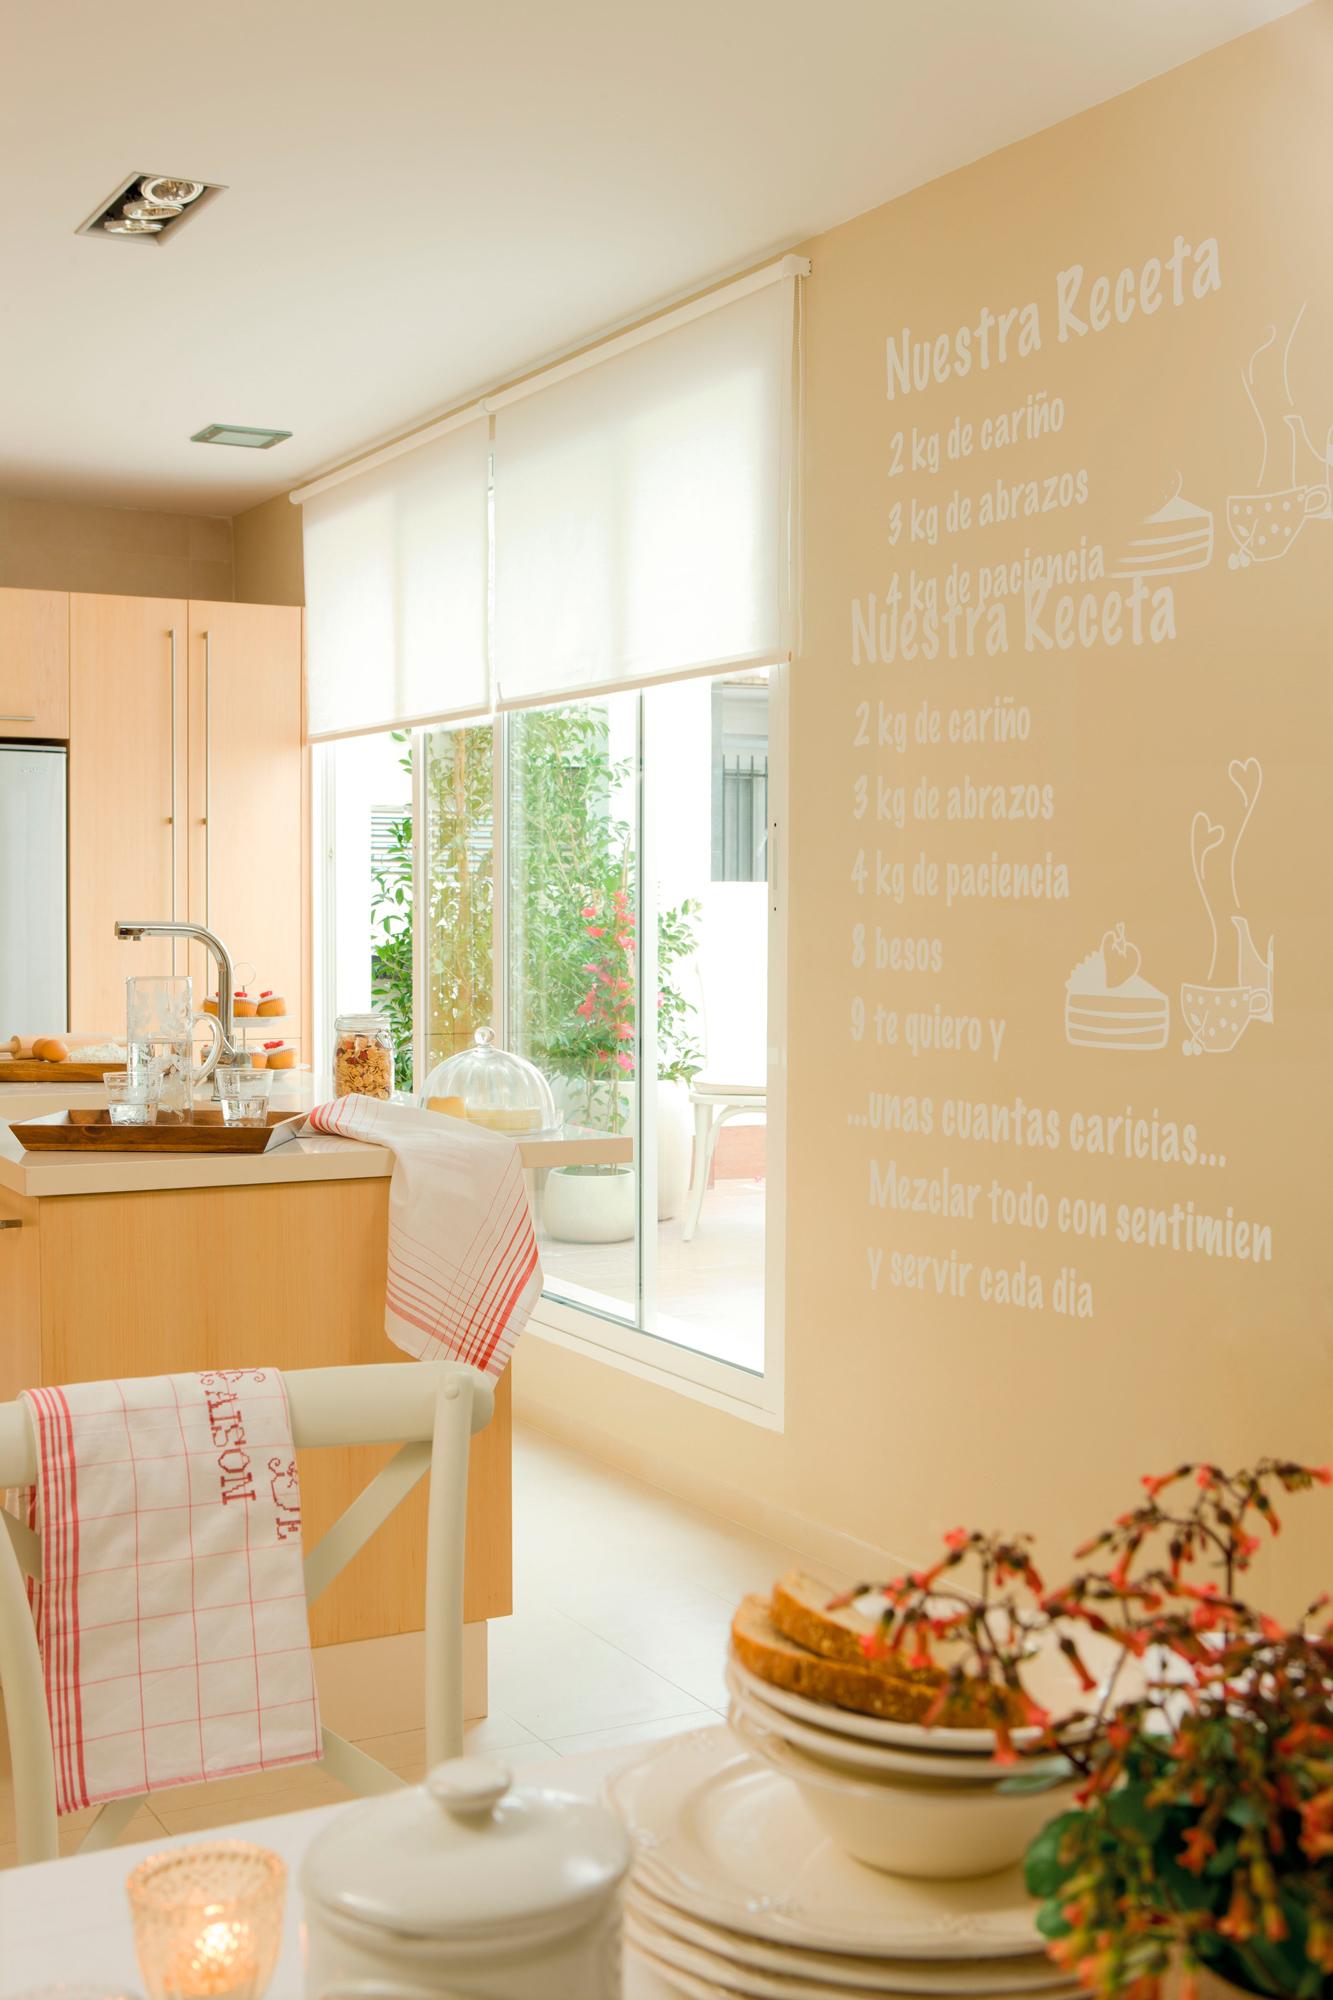 699 fotos de muebles de cocina for Paredes de cocina decoradas